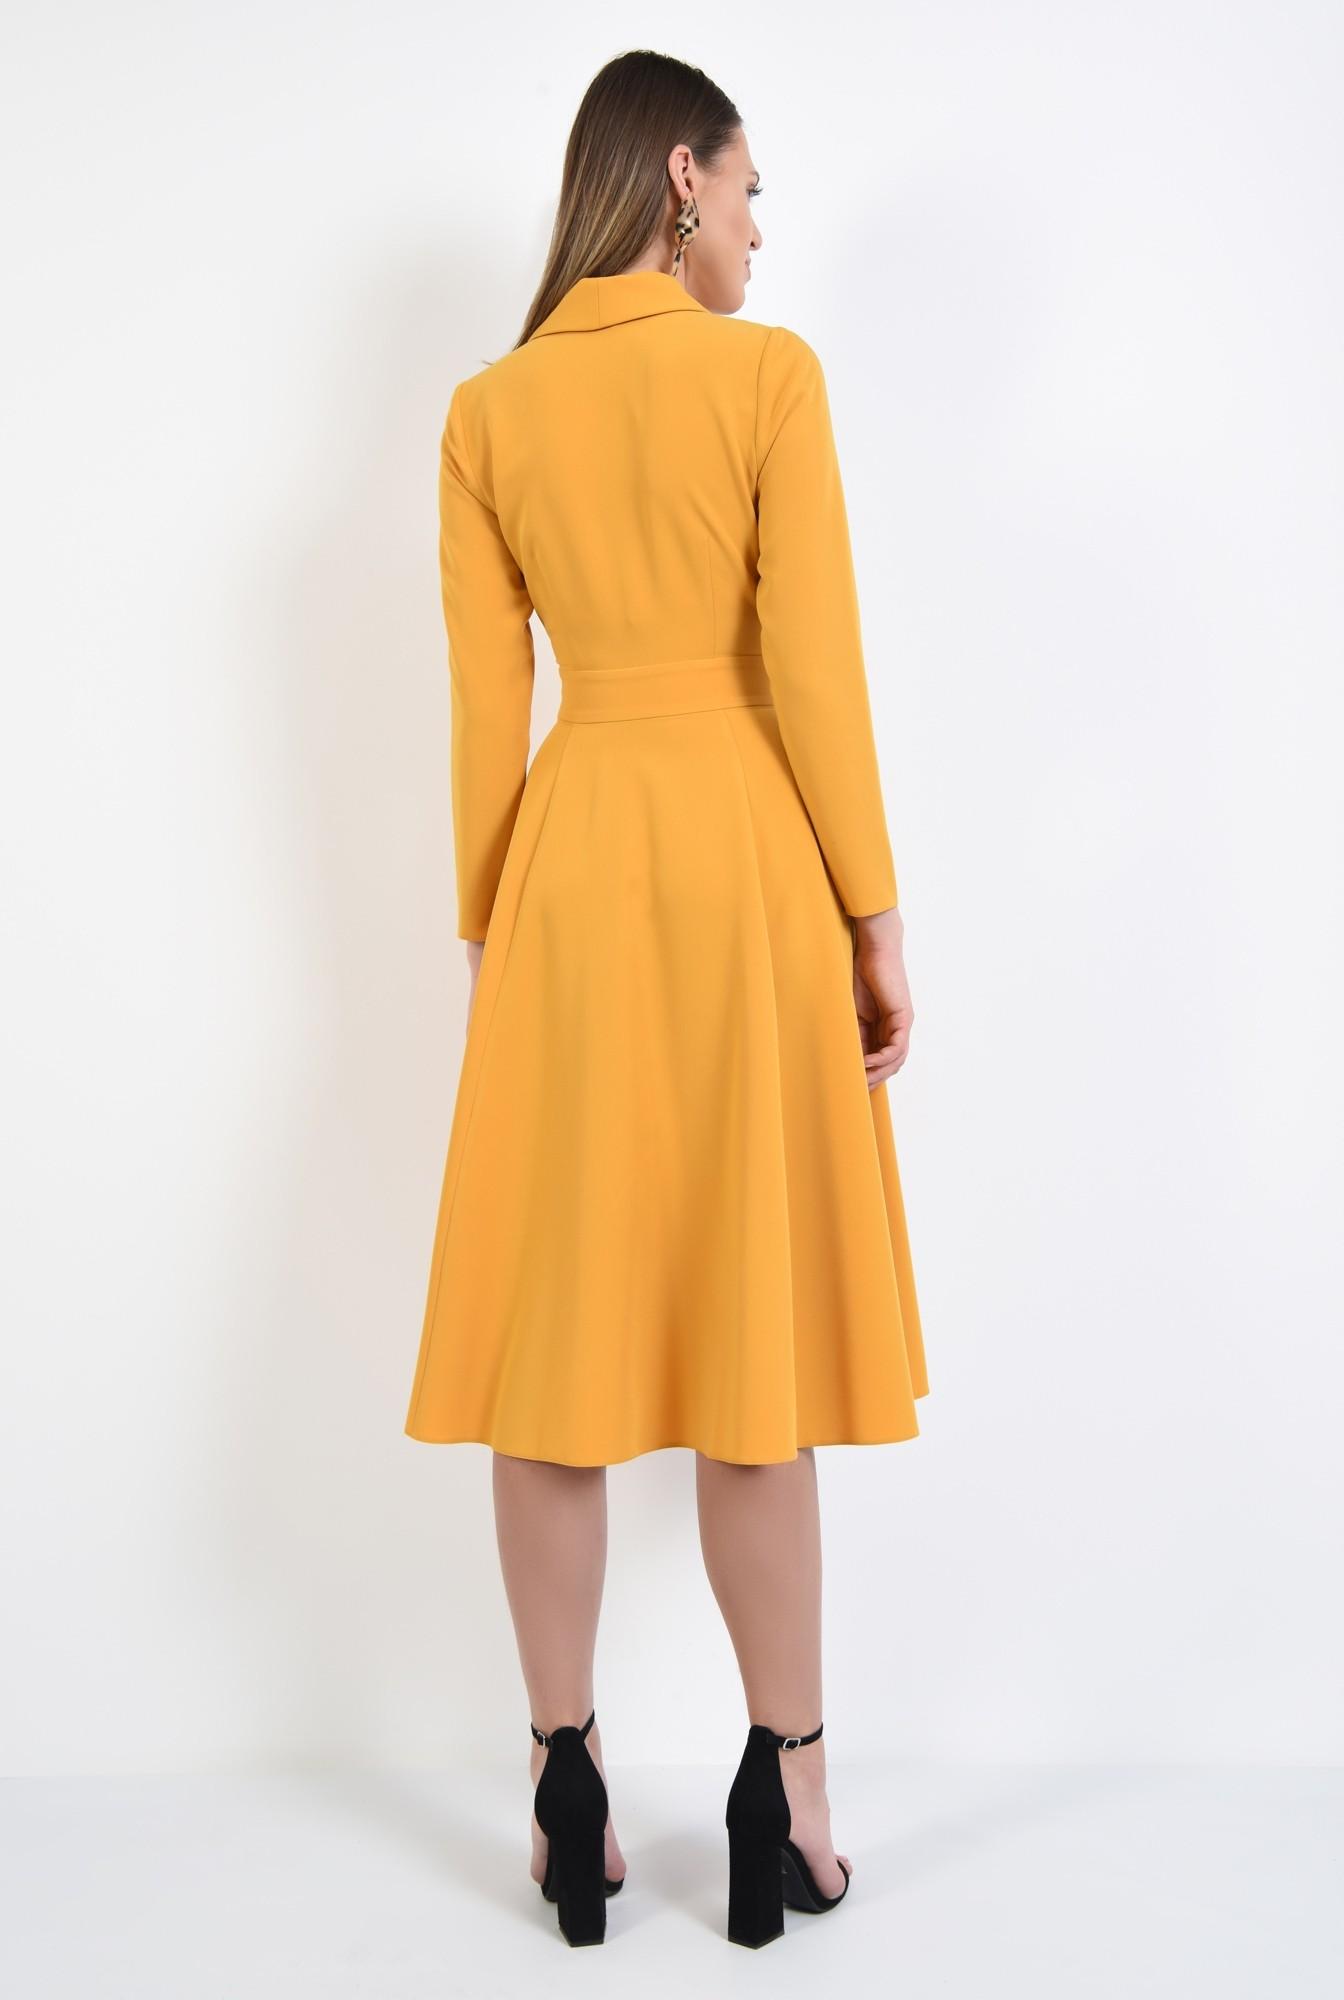 1 - rochie eleganta, de zi, mustar, maneci ajustate, anchior petrecut